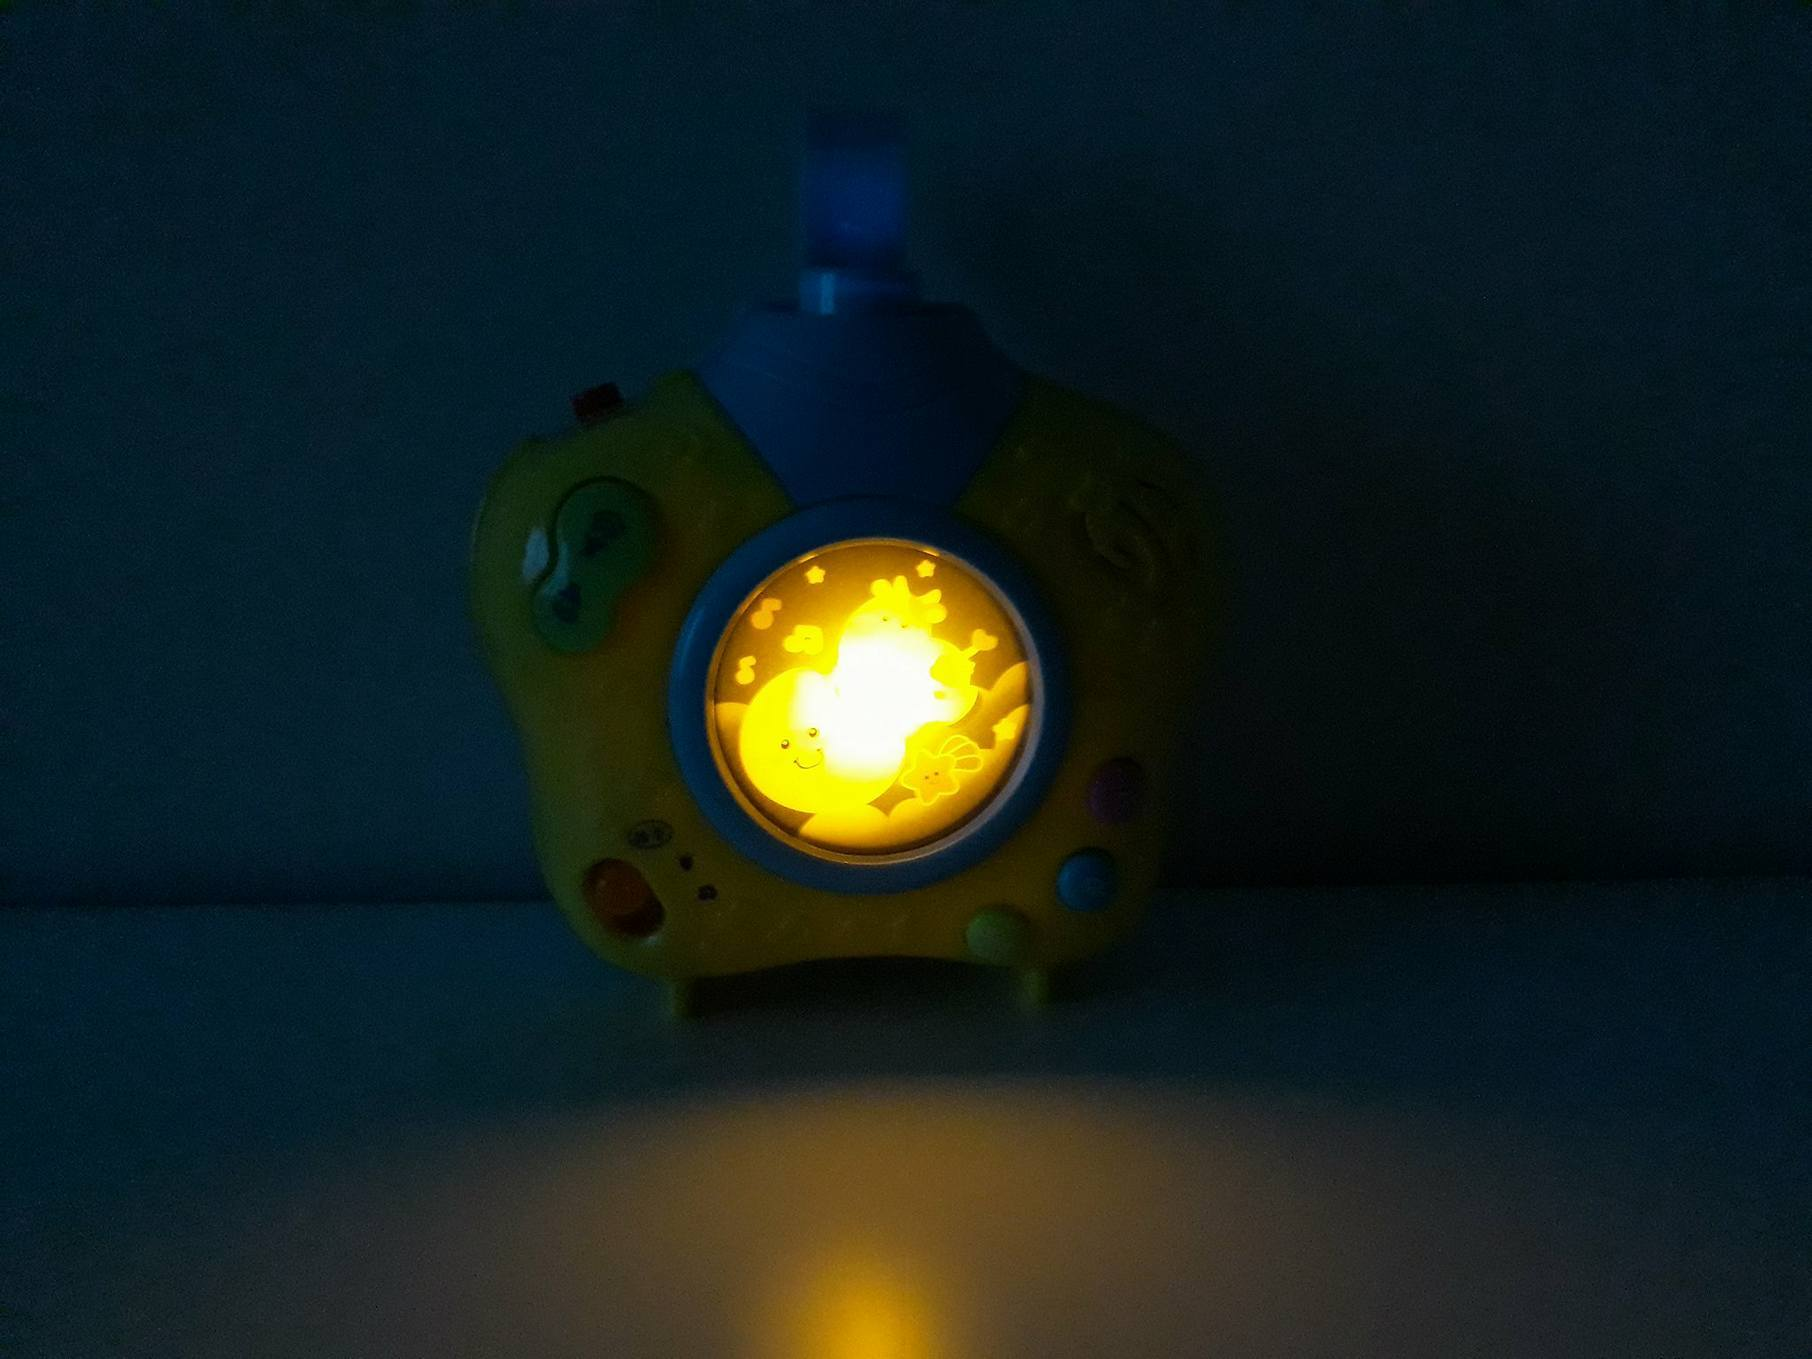 Projektor ilampka nocna wjednym Simly Play.